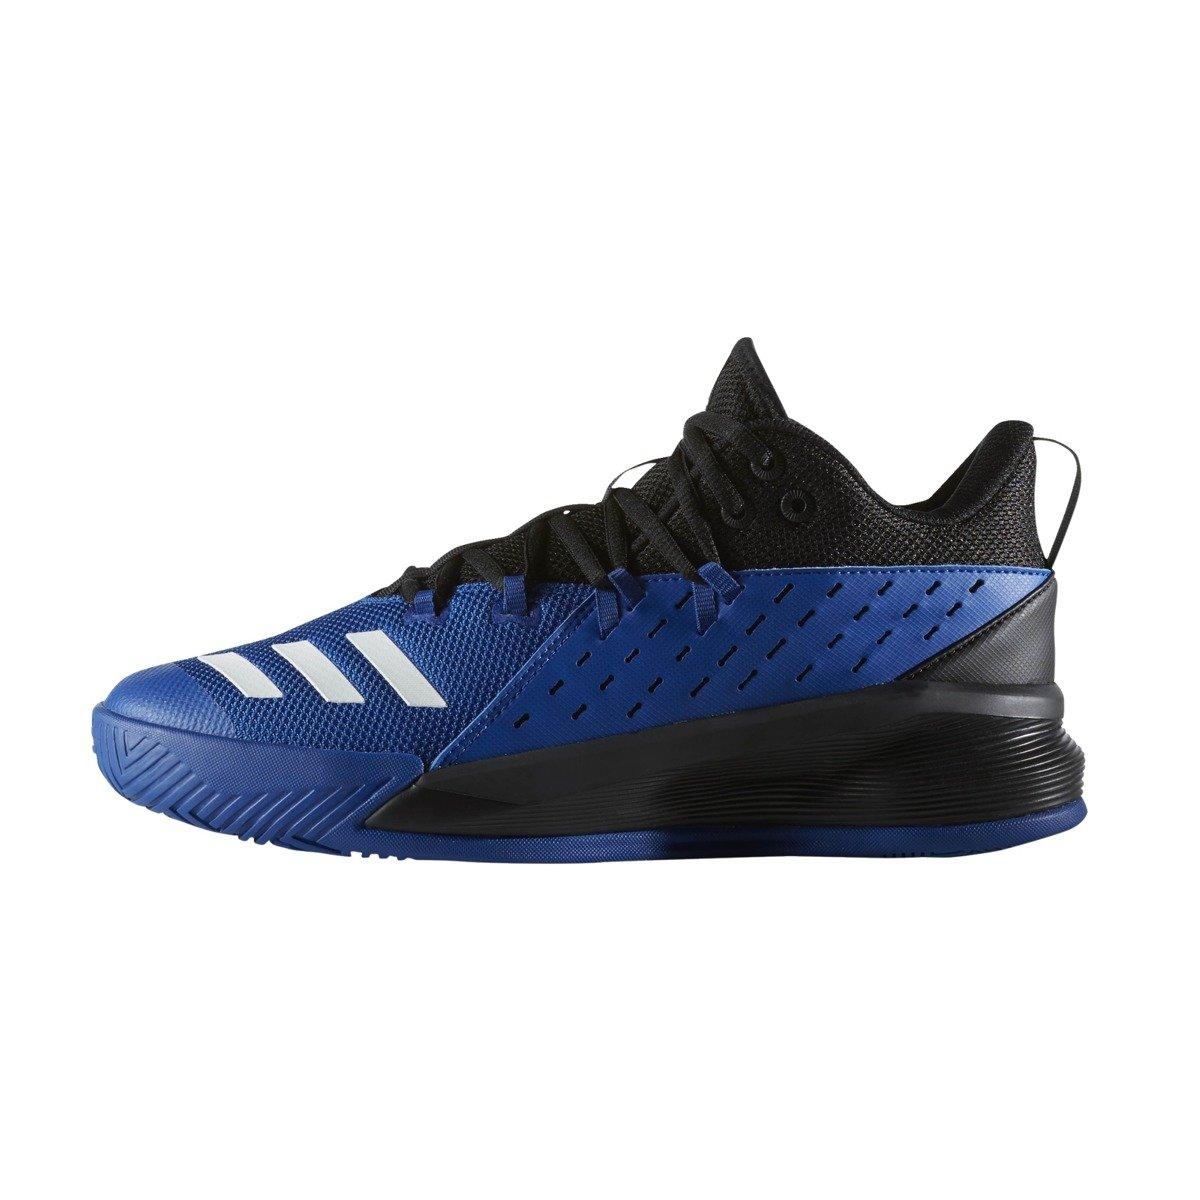 Used Adidas Basketball Shoes